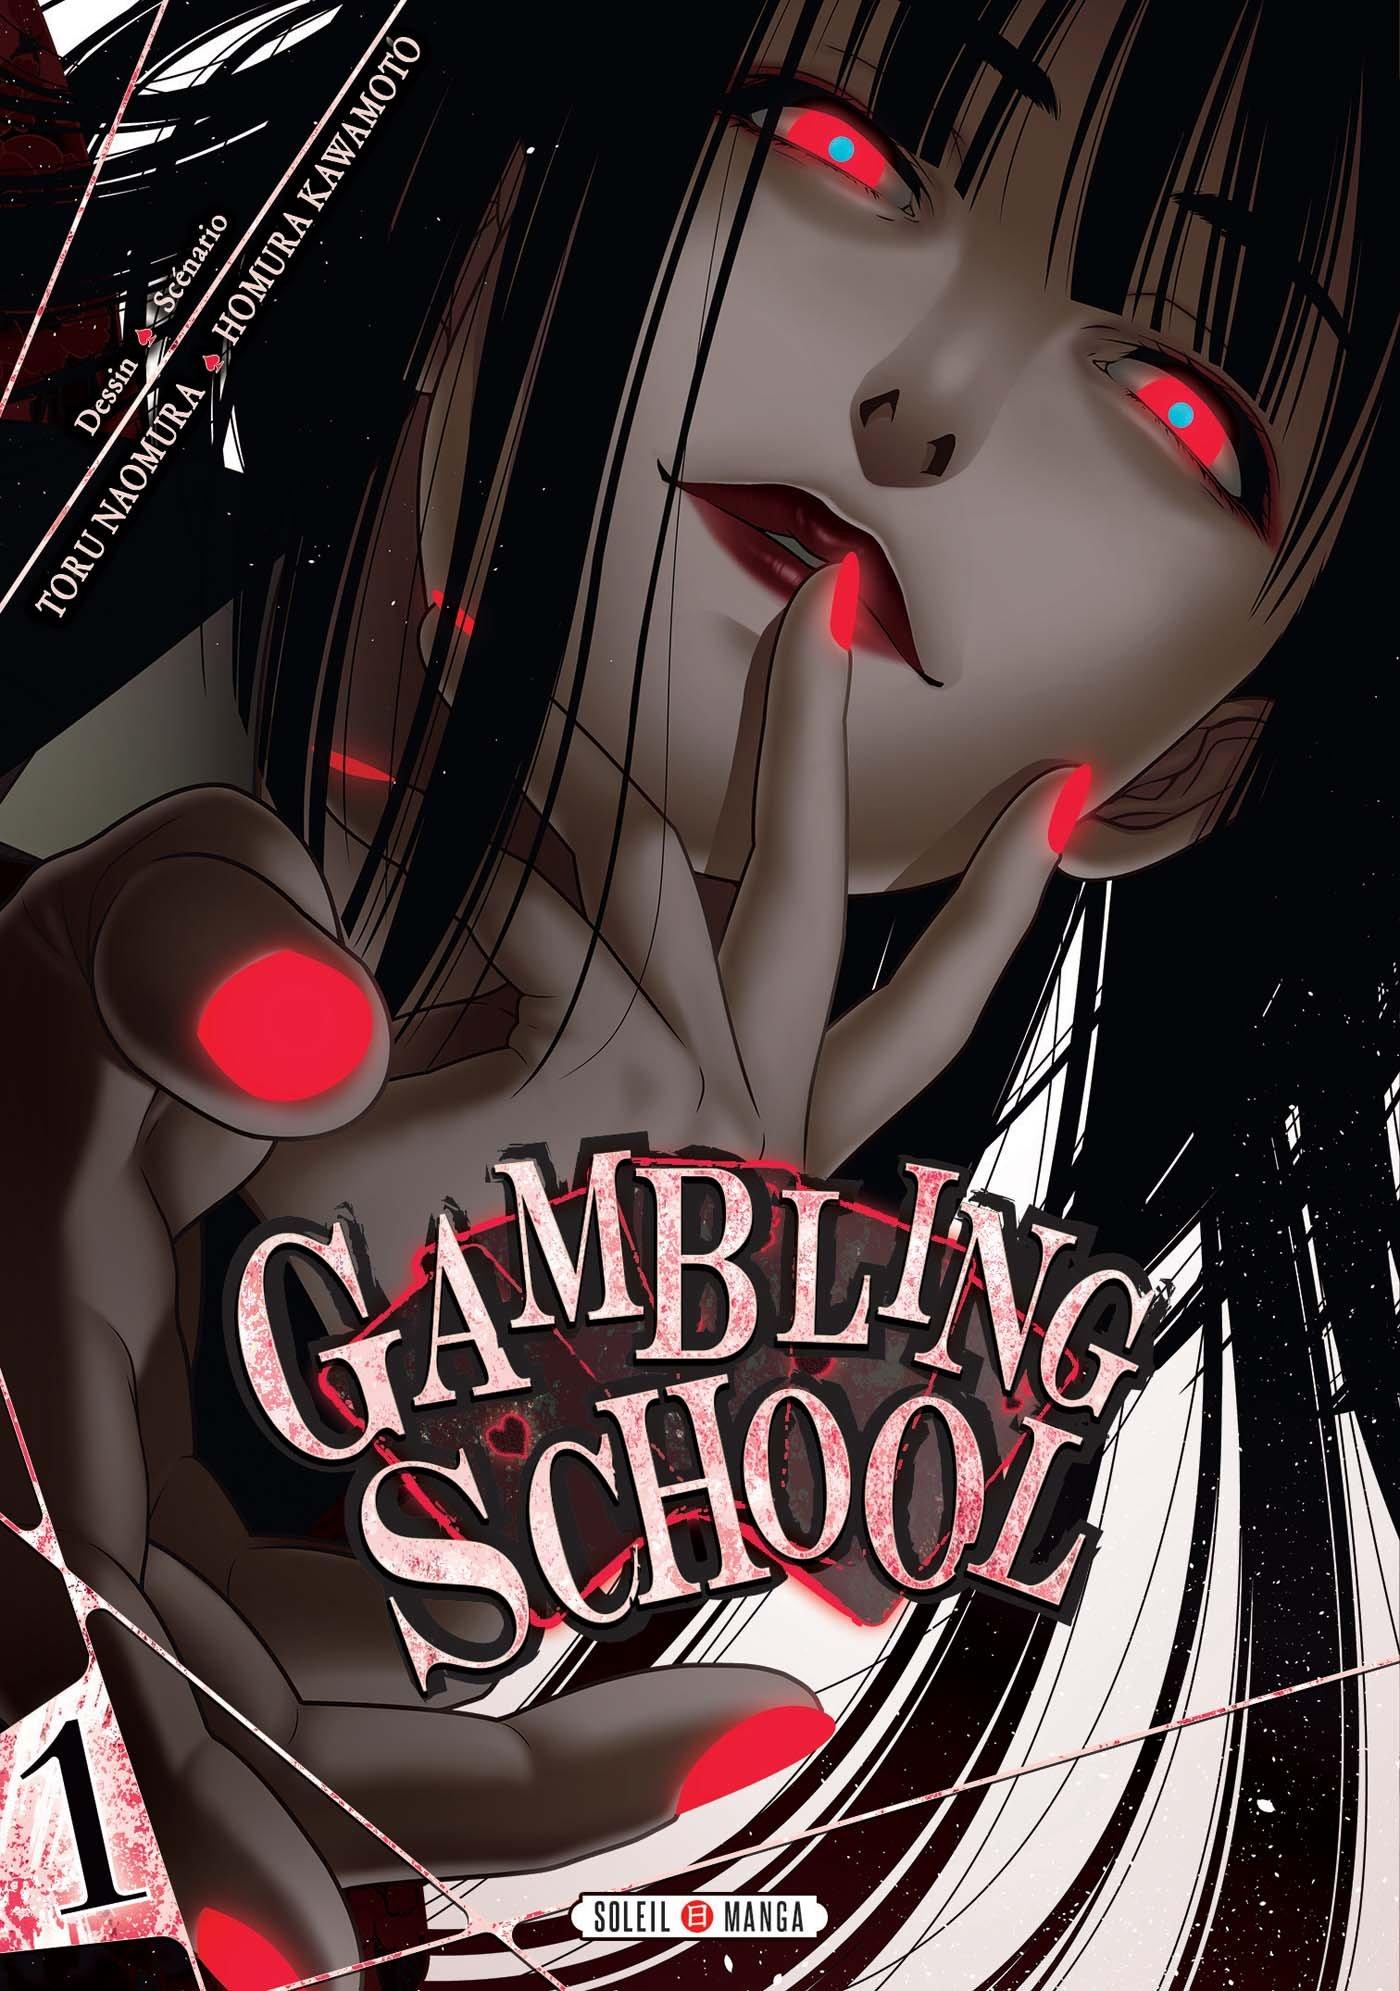 Gambling School 1